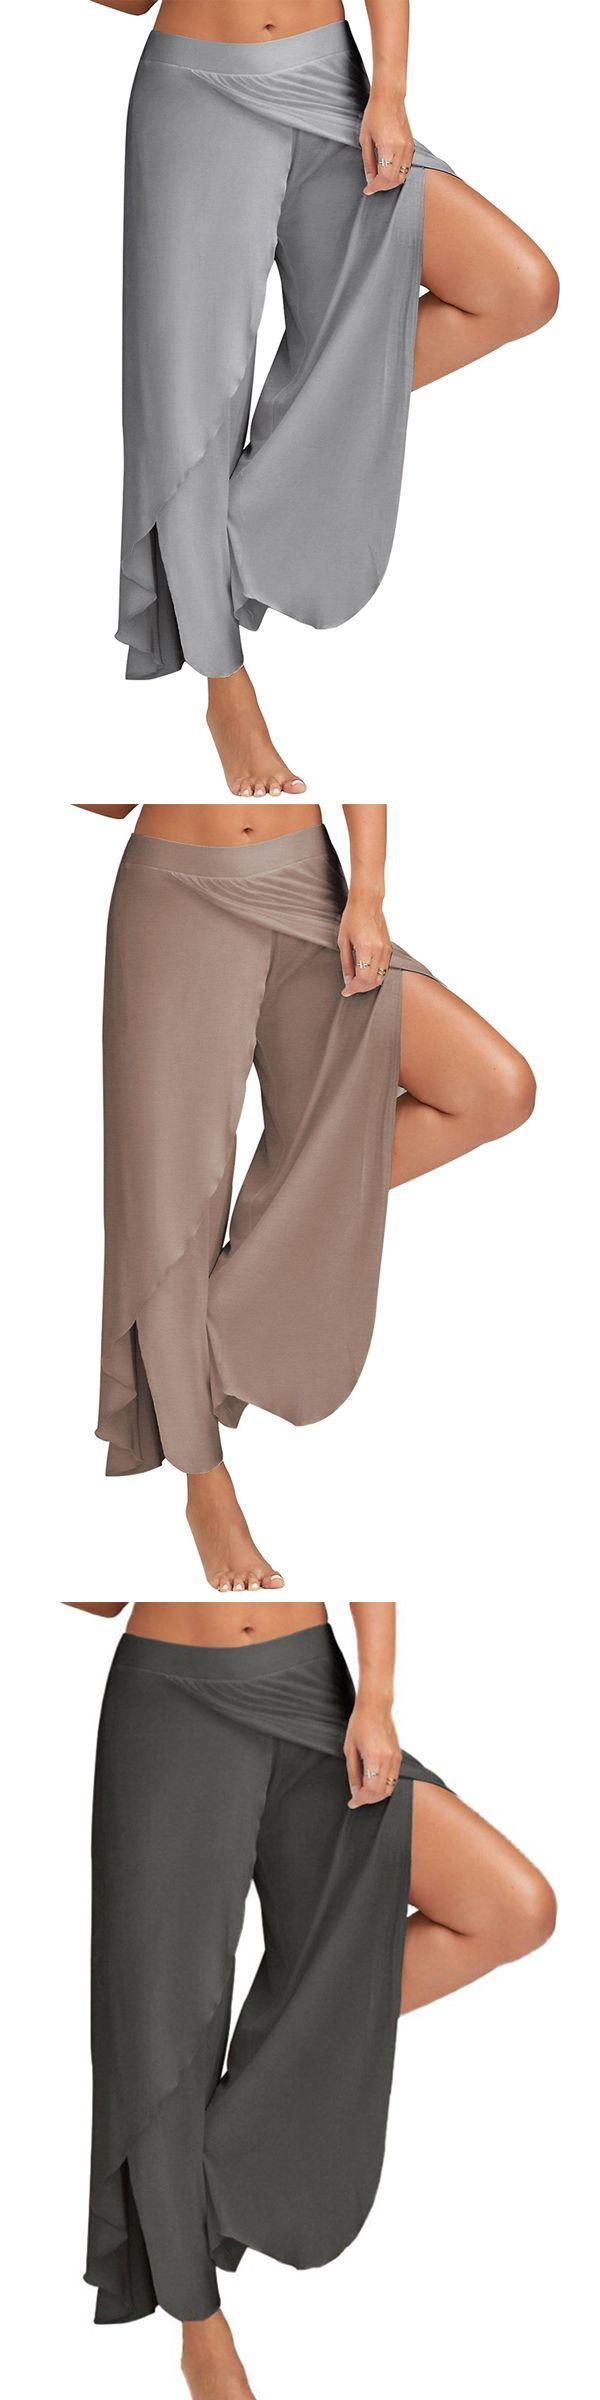 US$ 16.99 Women Casual Loose Solid Color Elastic Waist Slit Wide Leg Pants